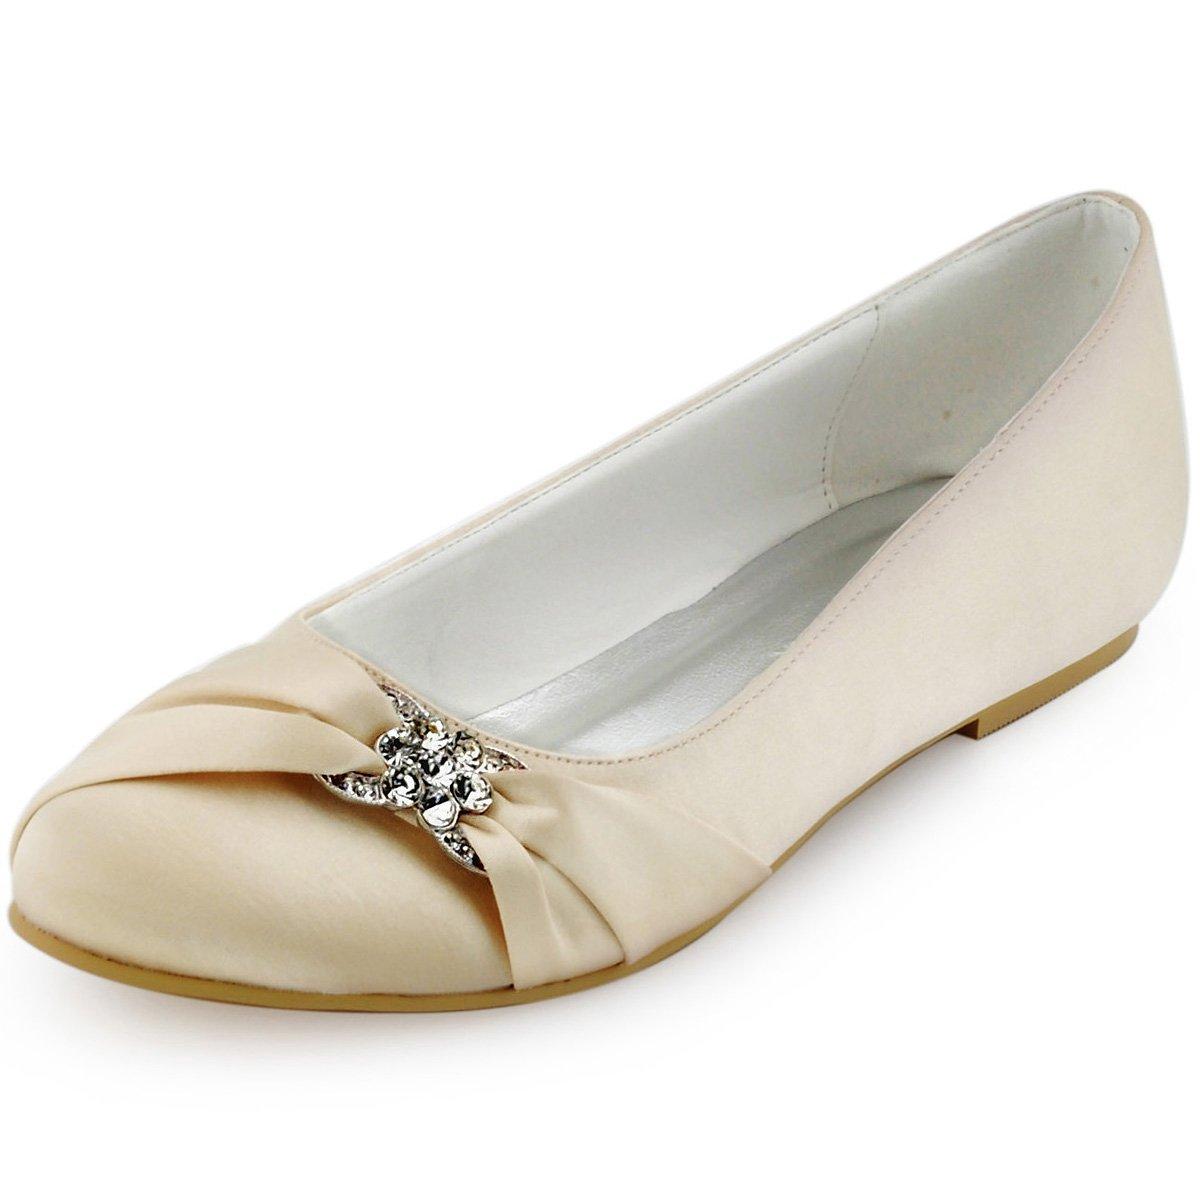 ElegantPark EP2006 Women Closed Rhinestones Comfort Flats Pleated Satin Wedding Bridal Shoes Champagne US 7